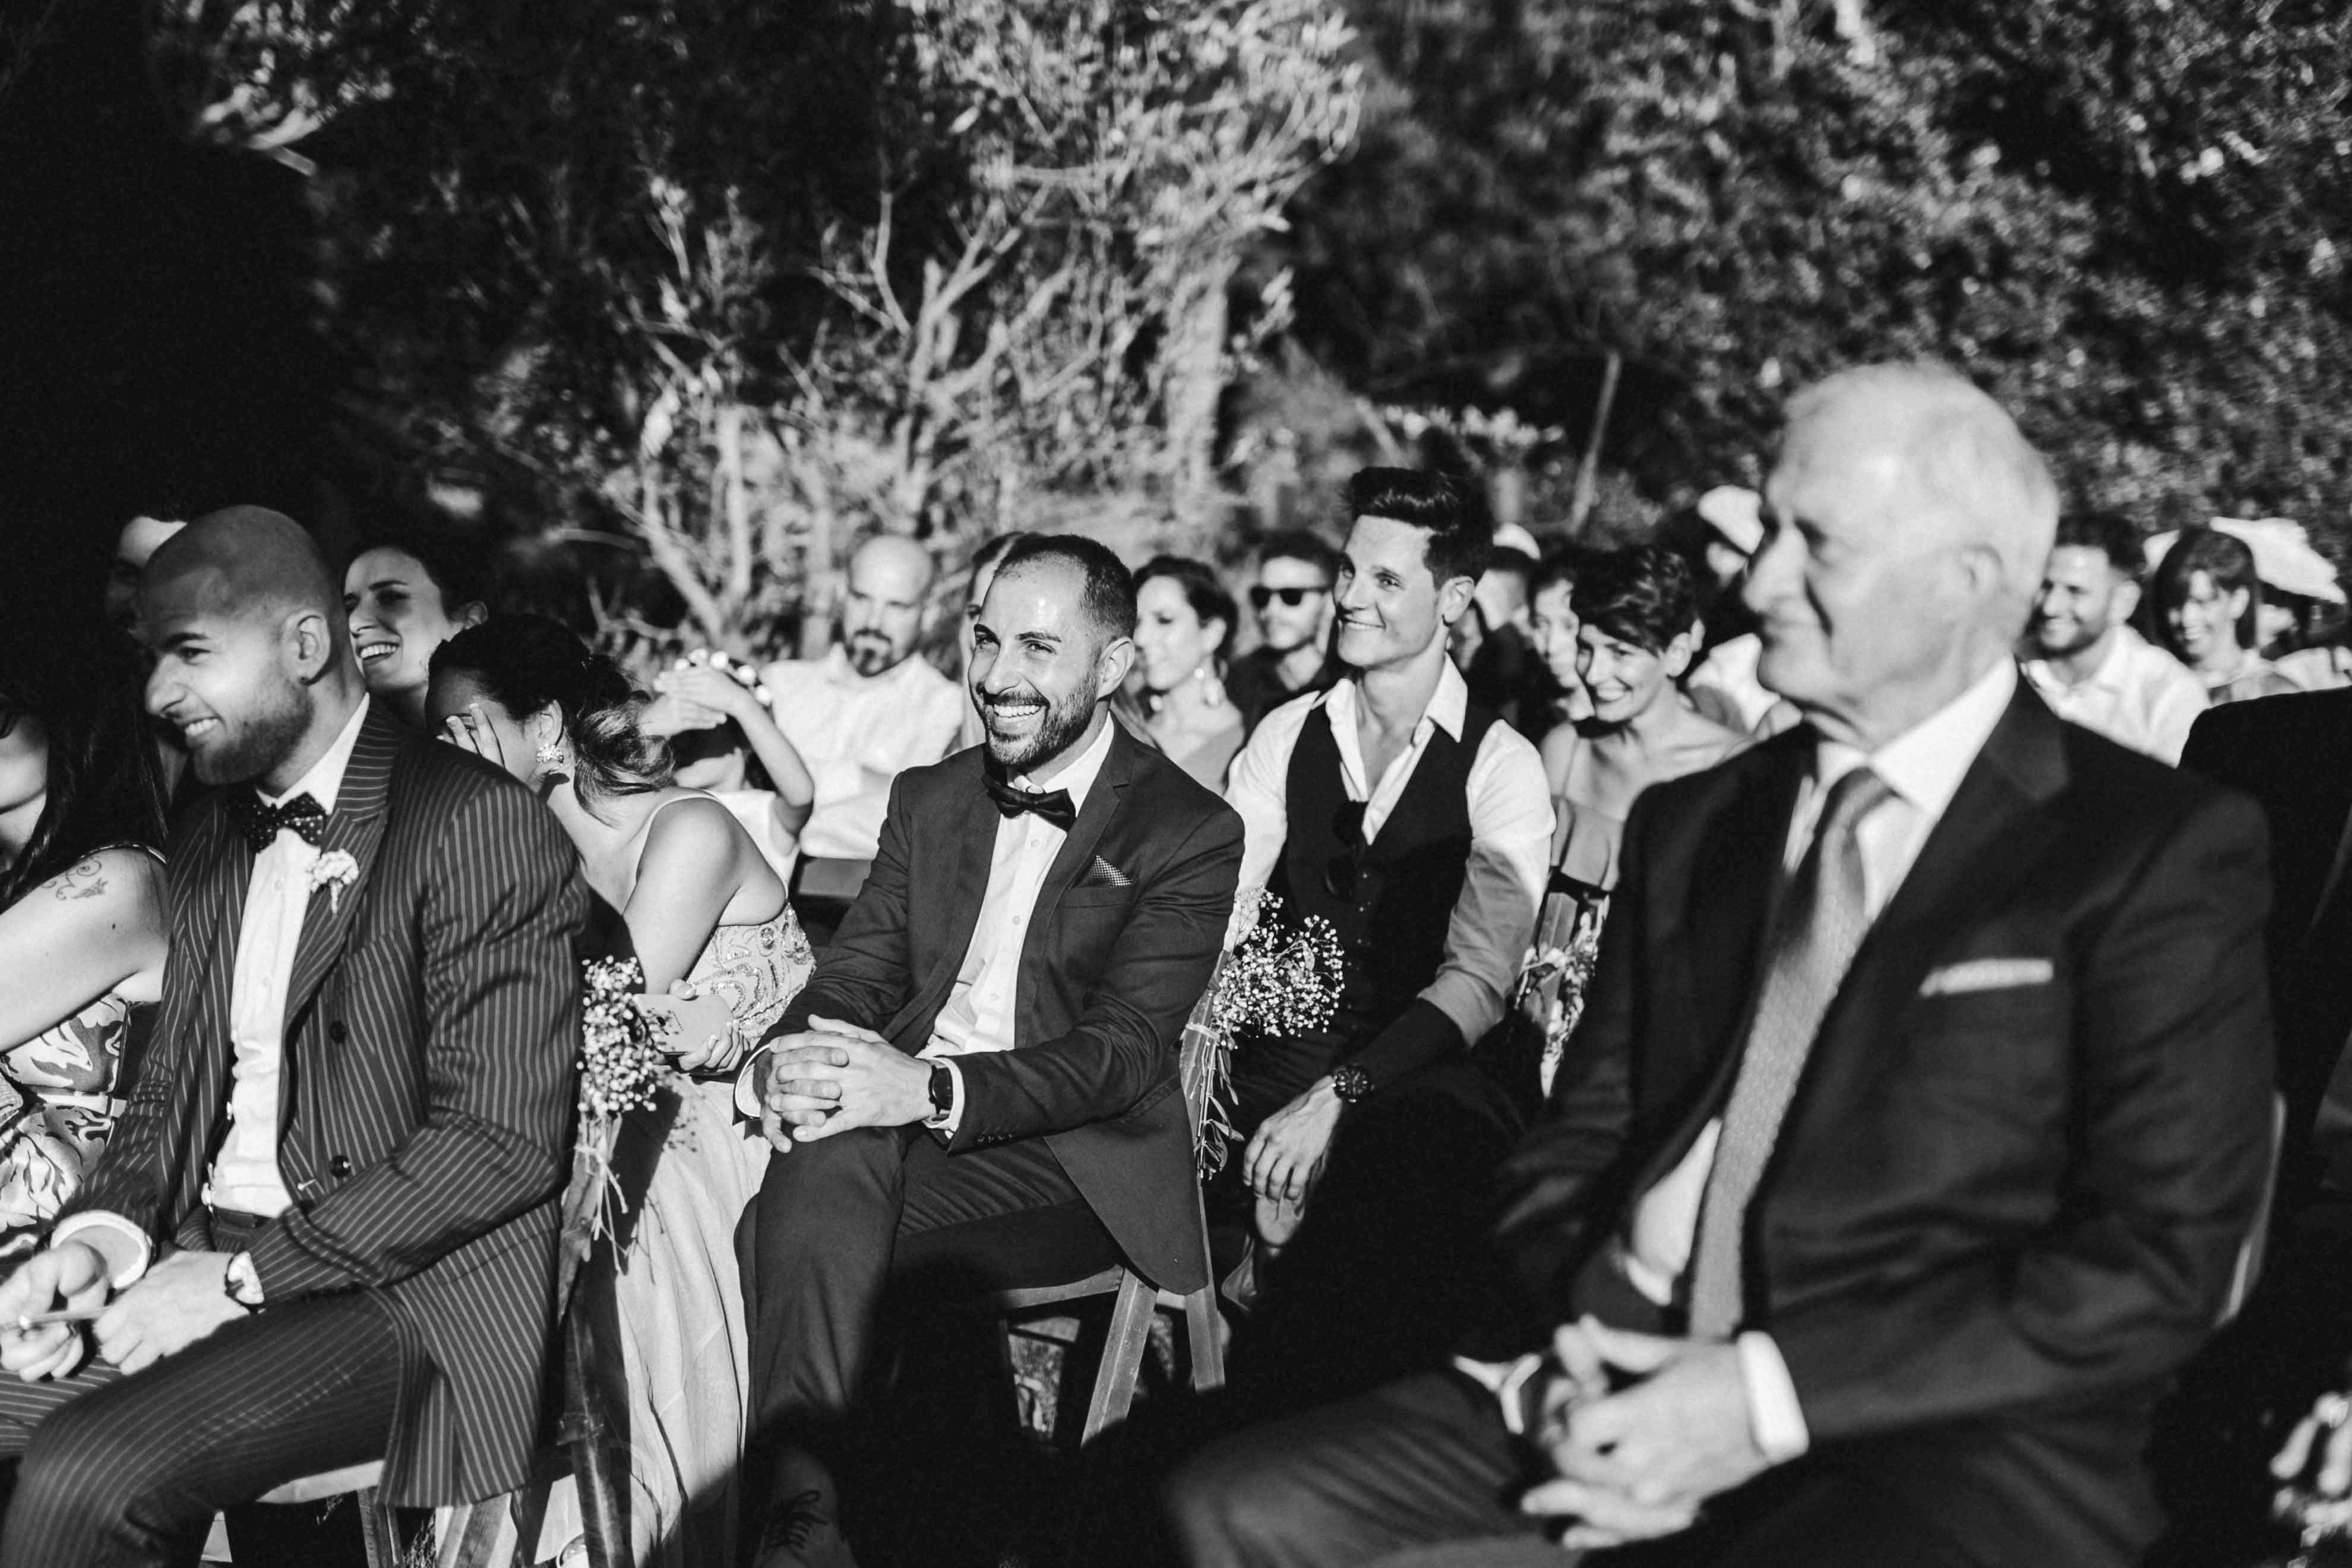 Boda rústica en la montaña. fotgrafo de bodas barcelona_054